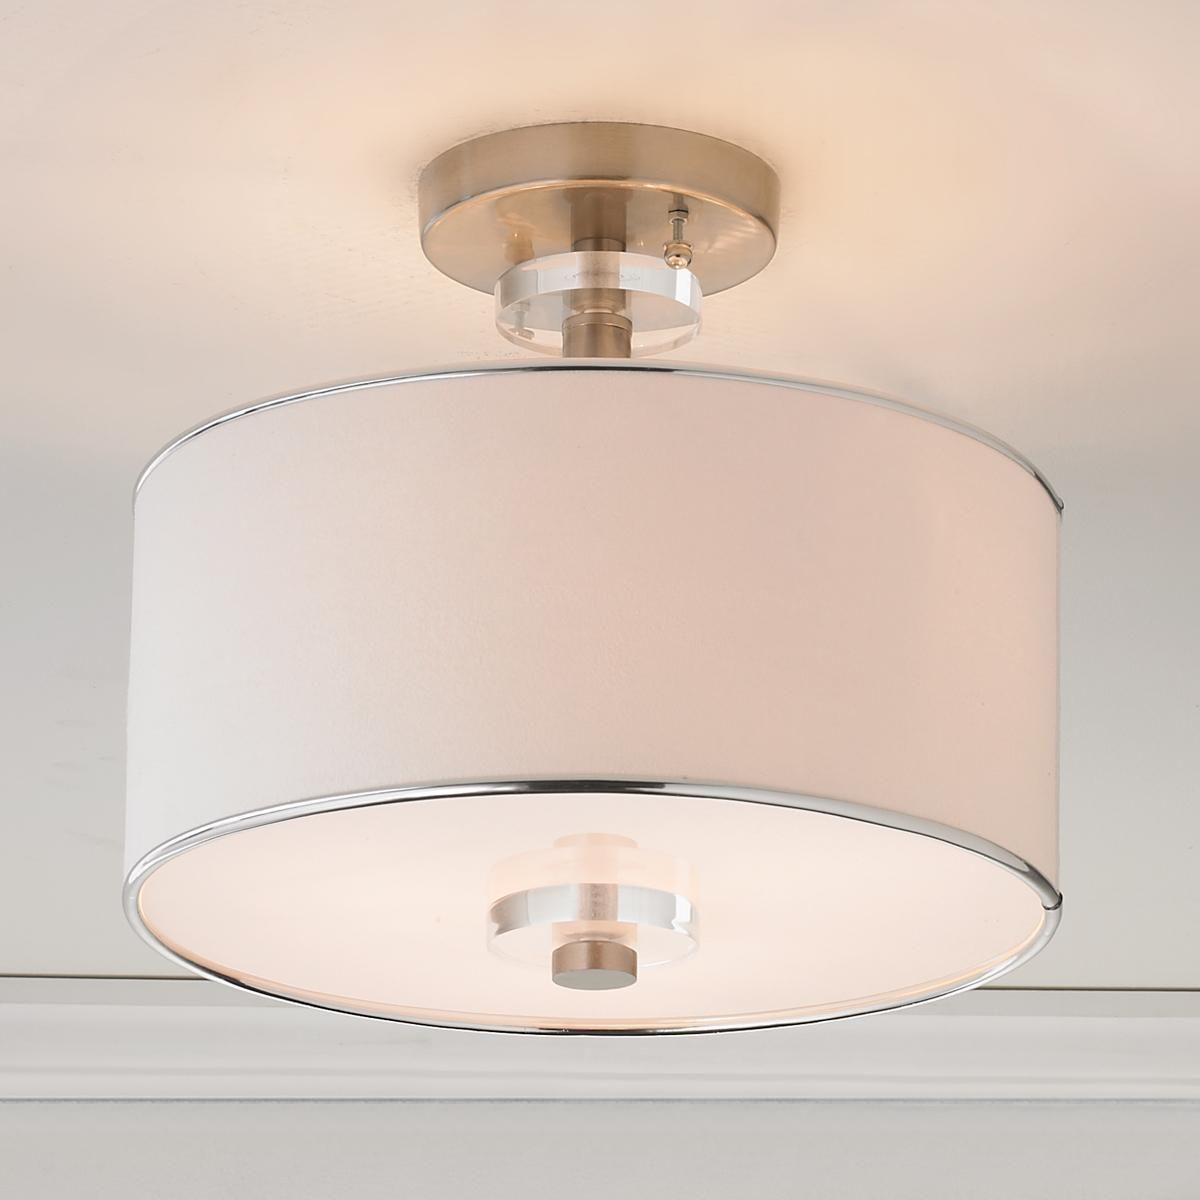 Modern Sleek Semi Flush Ceiling Light Semi Flush Ceiling Lights Flush Ceil